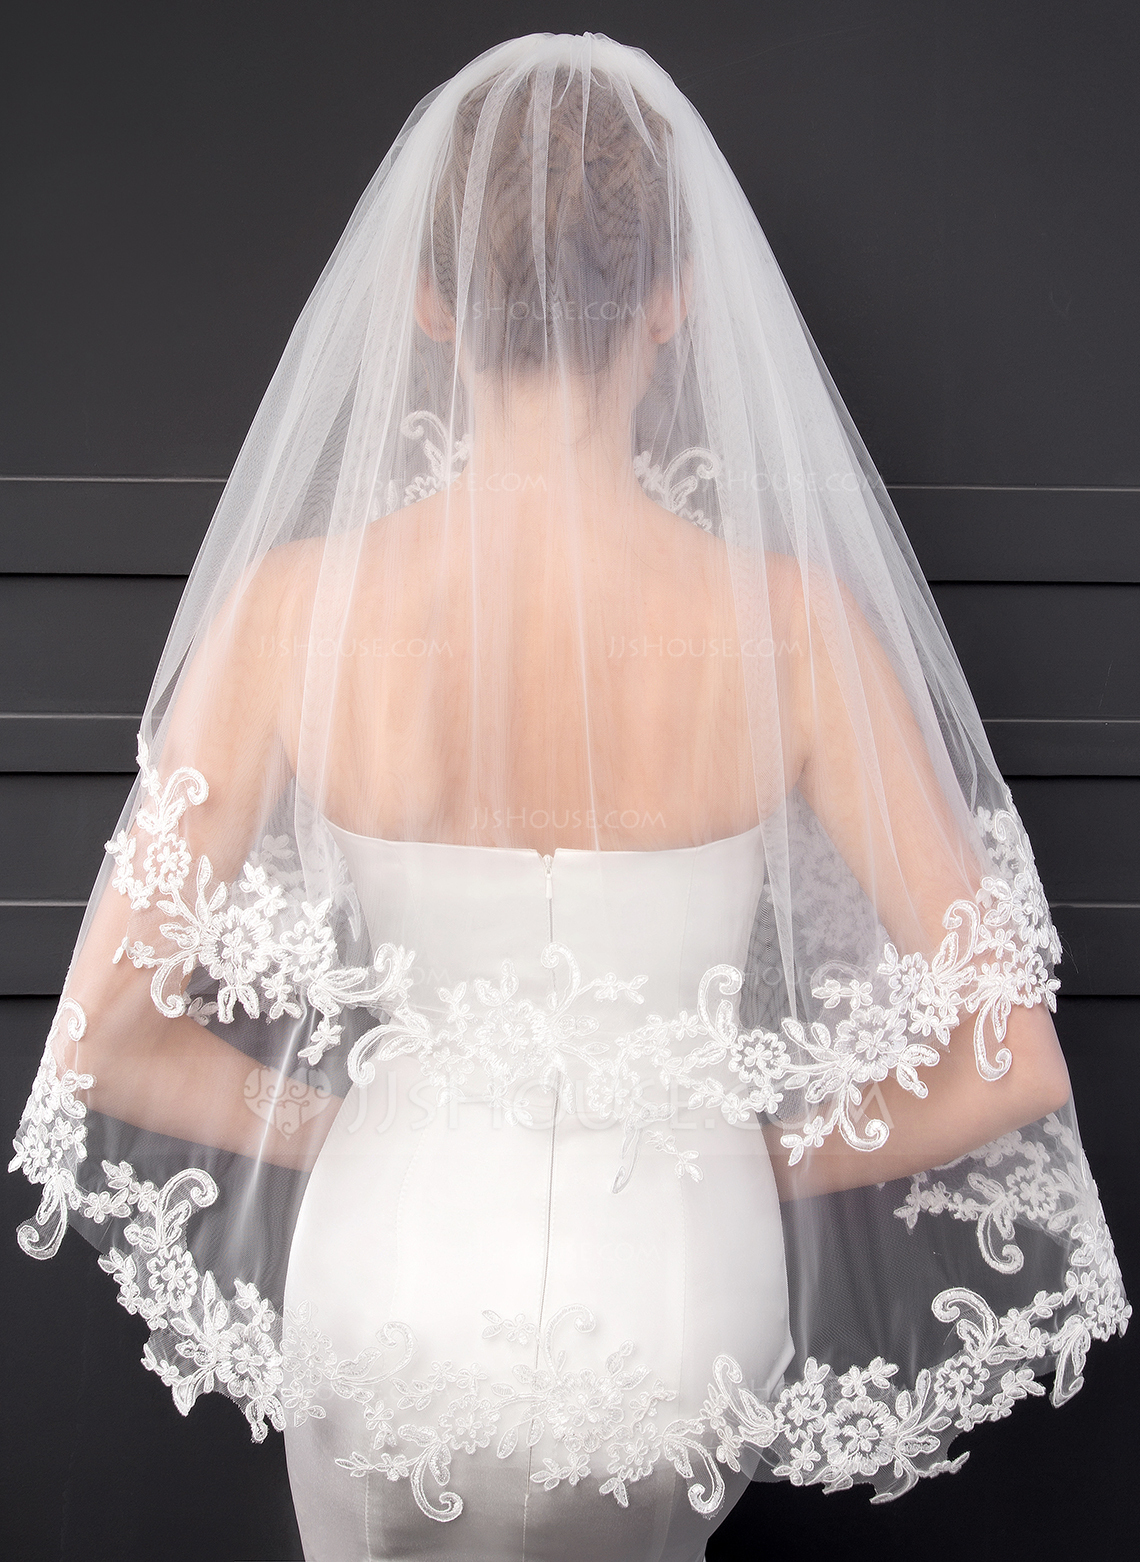 Two Tier Lace Applique Edge Elbow Bridal Veils With Lace